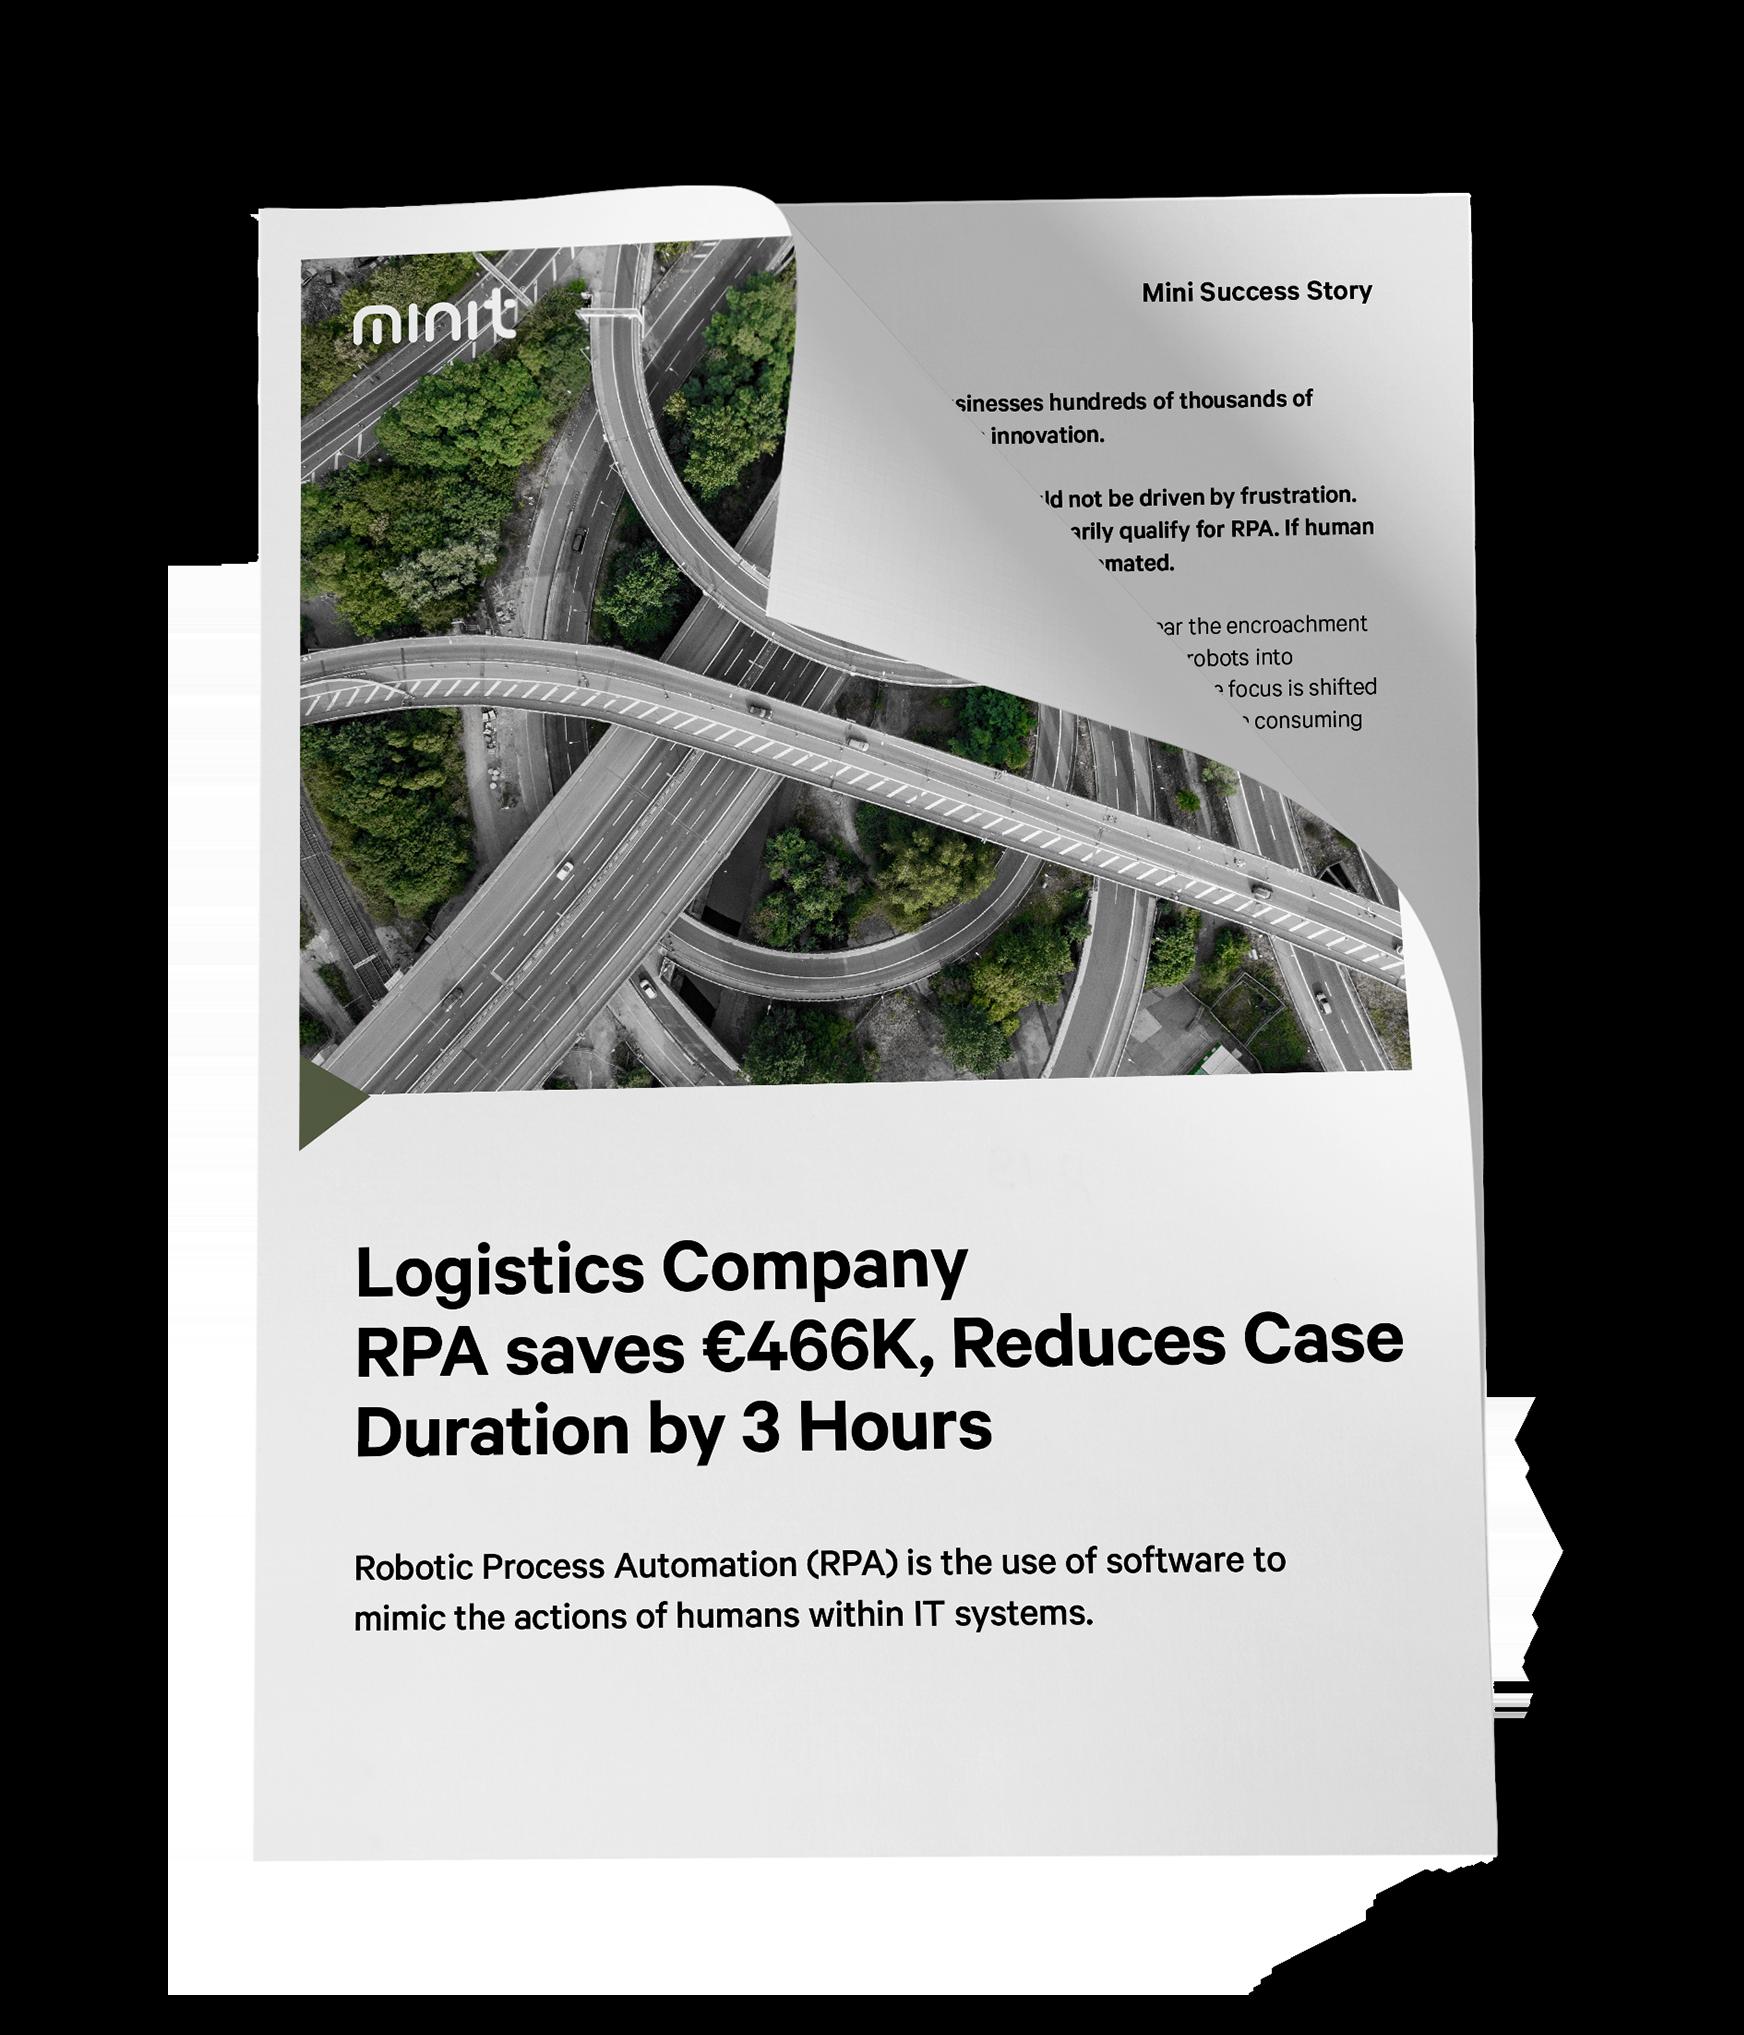 minit-success-story-logistics-company@3x